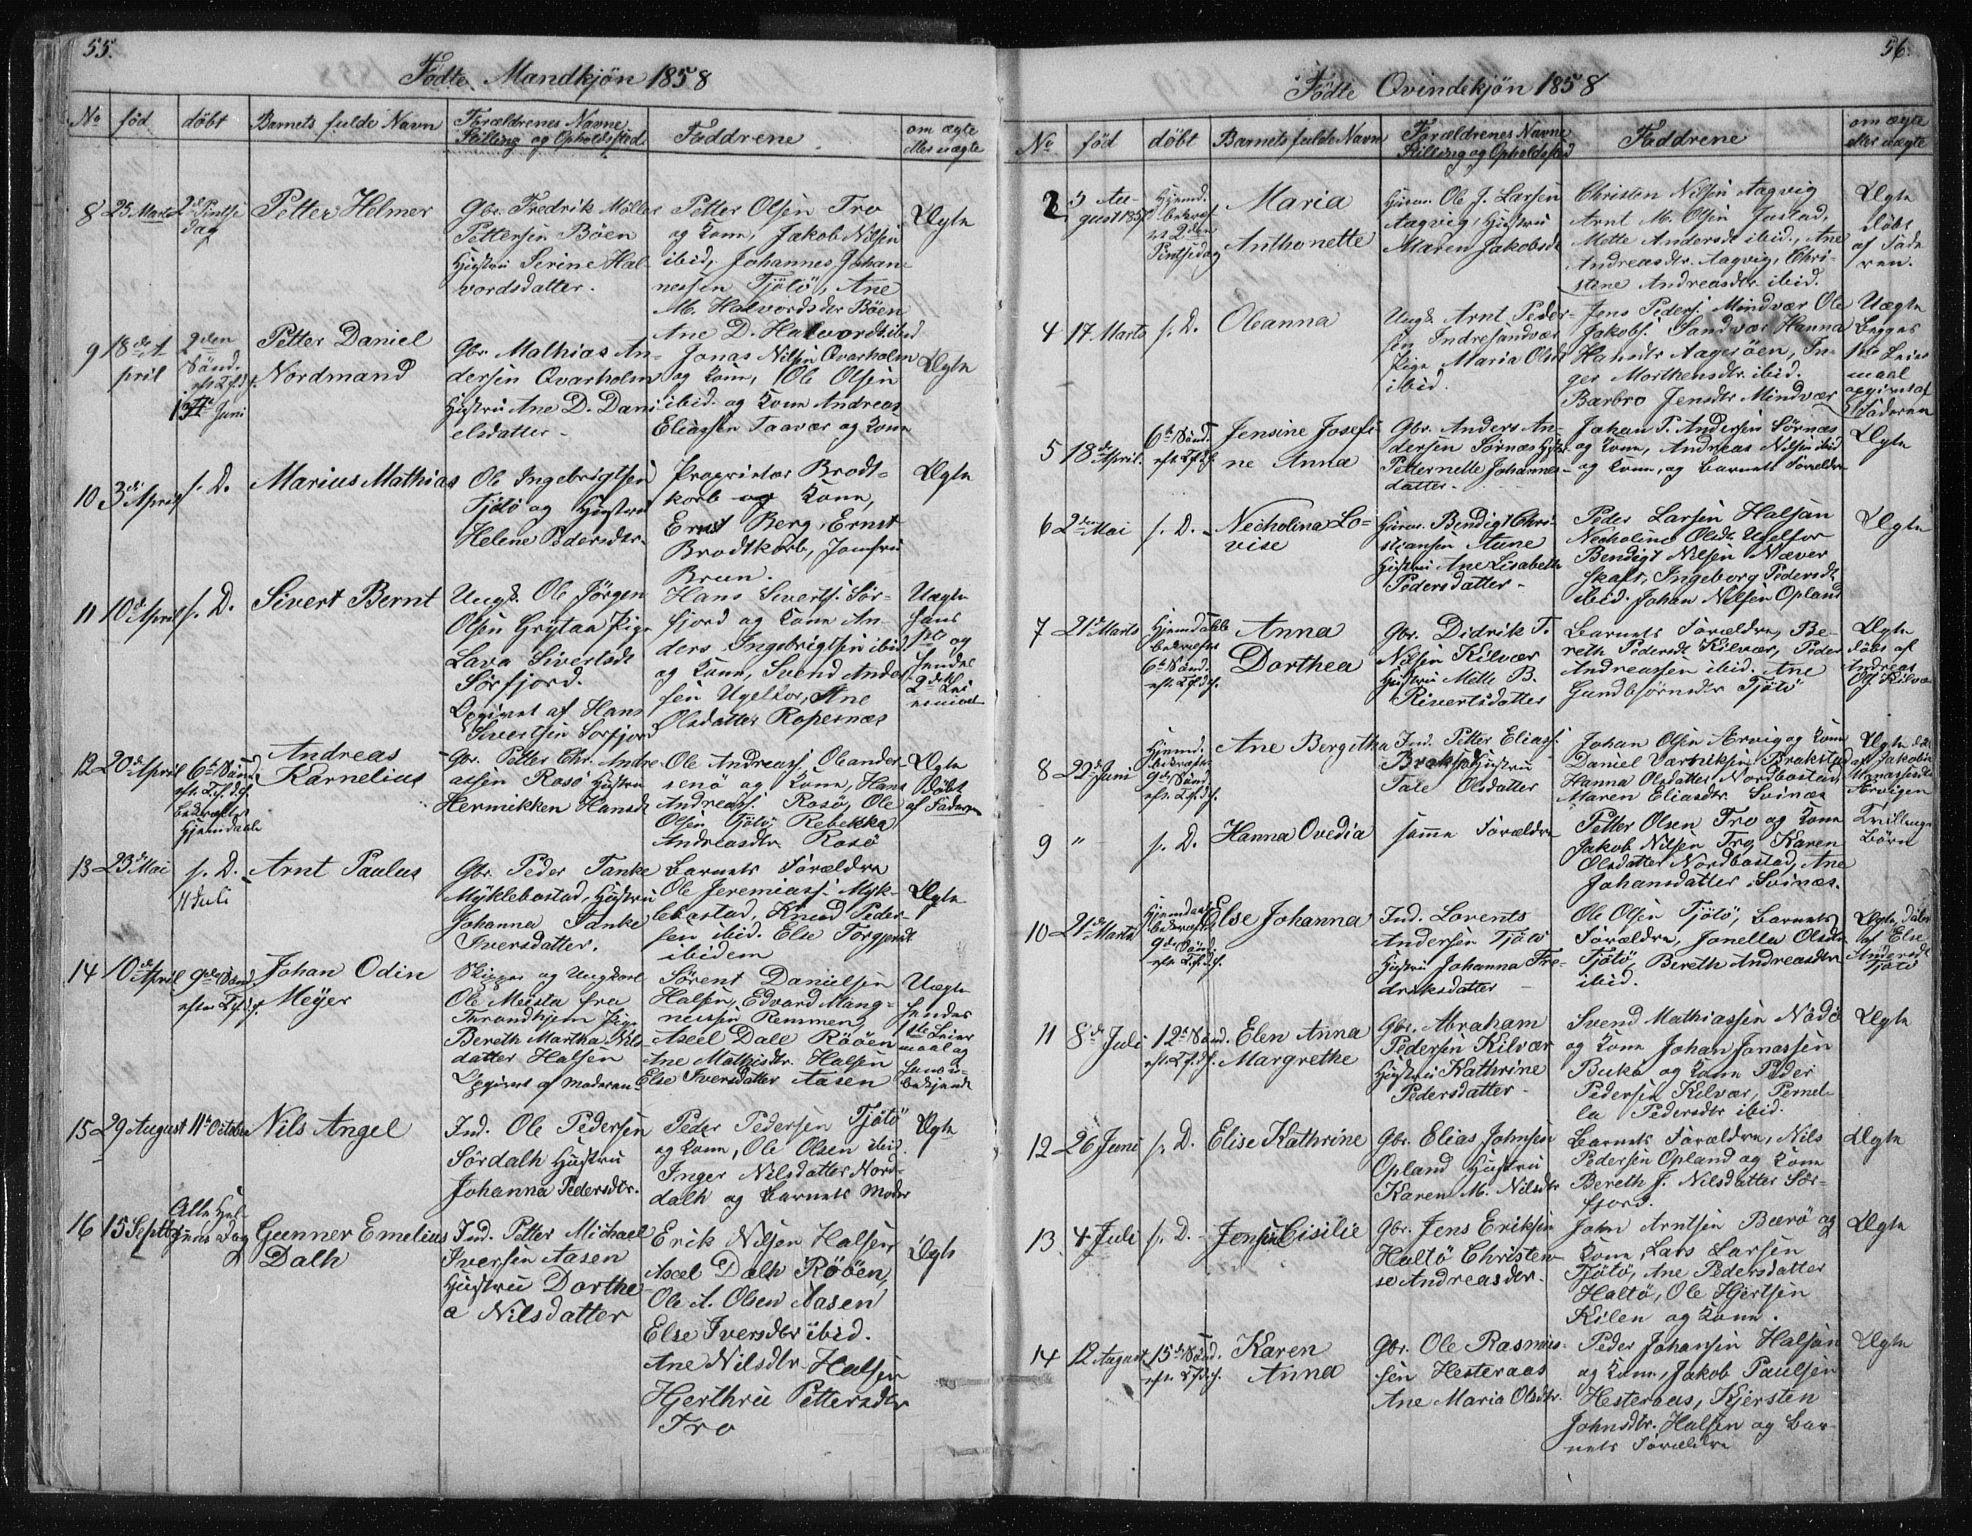 SAT, Ministerialprotokoller, klokkerbøker og fødselsregistre - Nordland, 817/L0266: Klokkerbok nr. 817C01, 1841-1869, s. 55-56